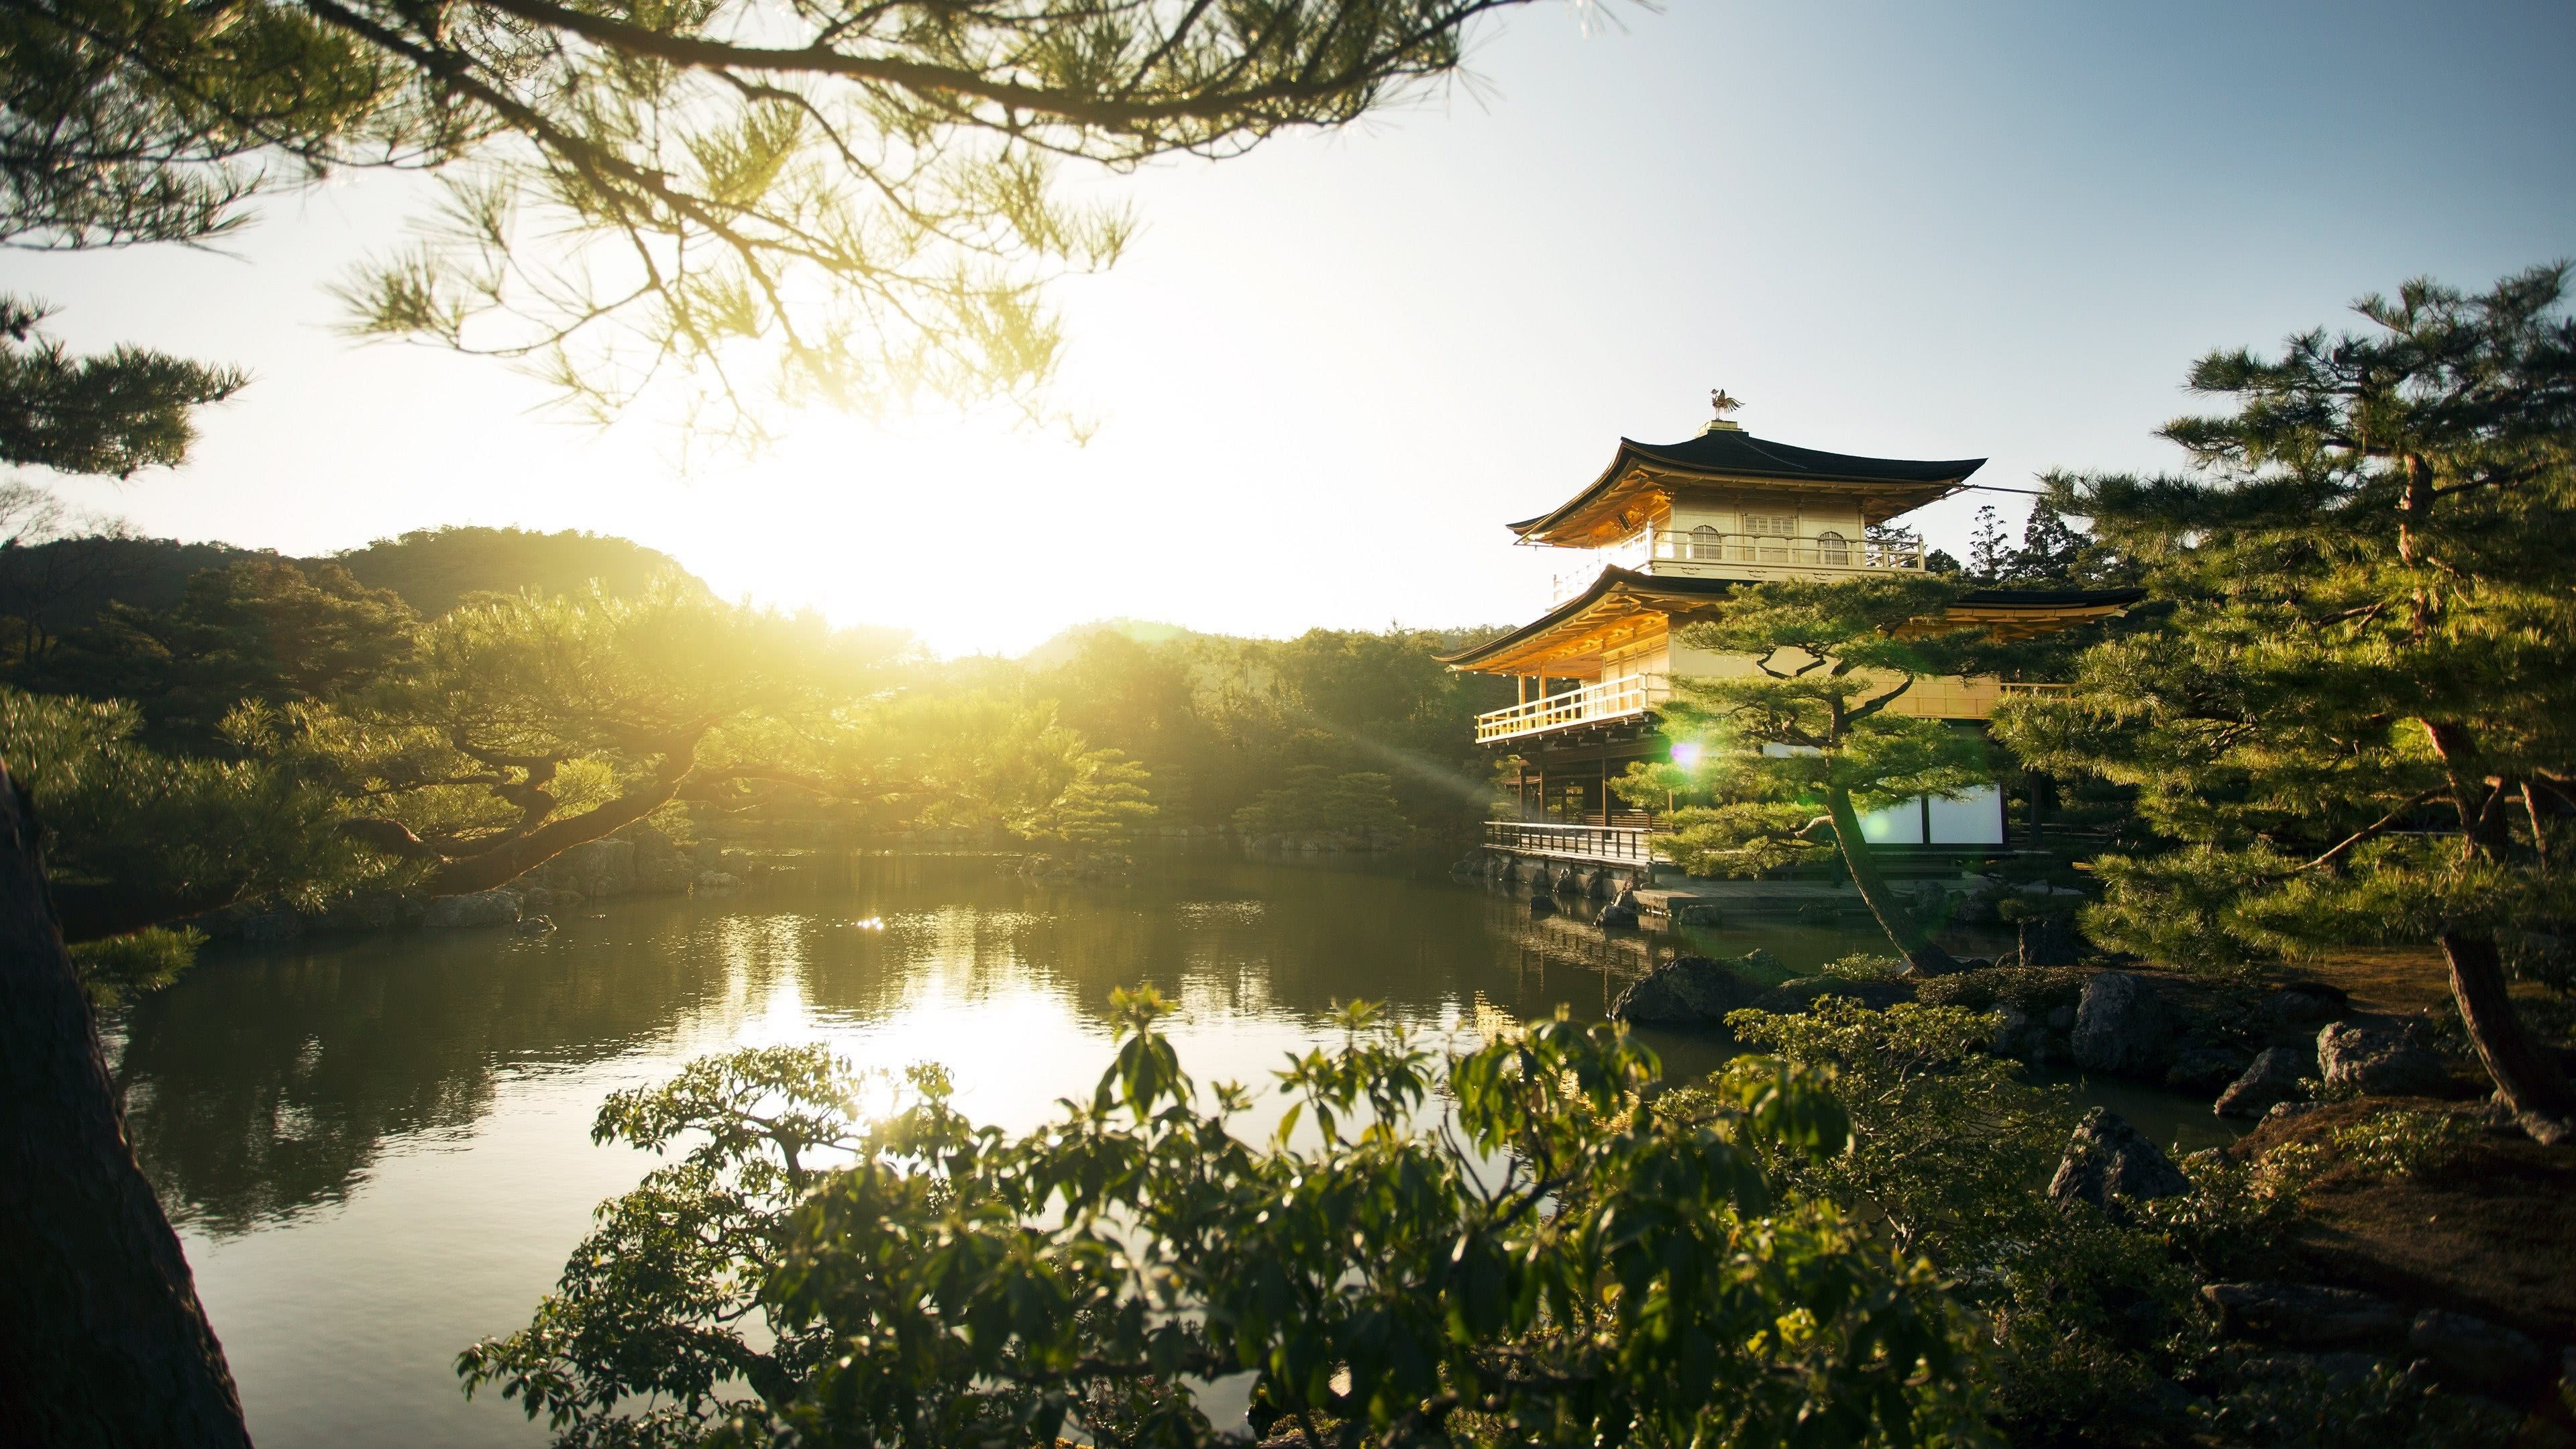 Temple Of The Golden Pavilion, Kinkaku Ji, Kyoto, Japan 4k UHD [3840 X 2160]